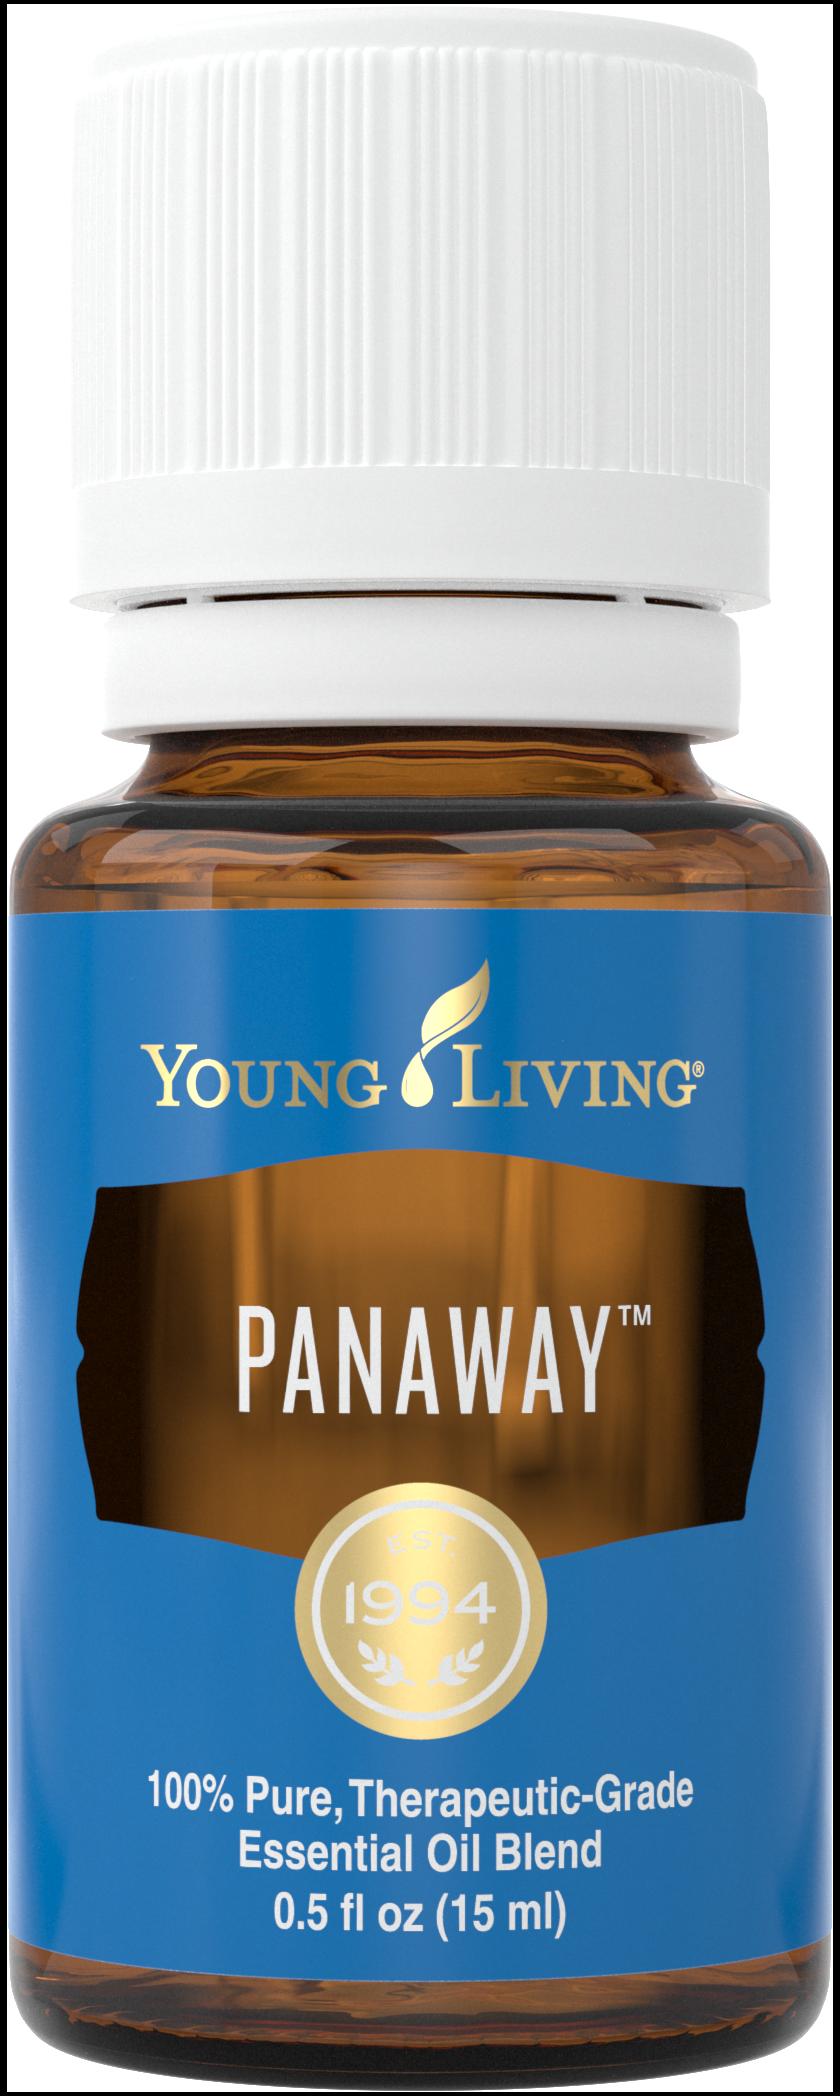 Manfaat dan penggunaan minyak atsiri PanAway